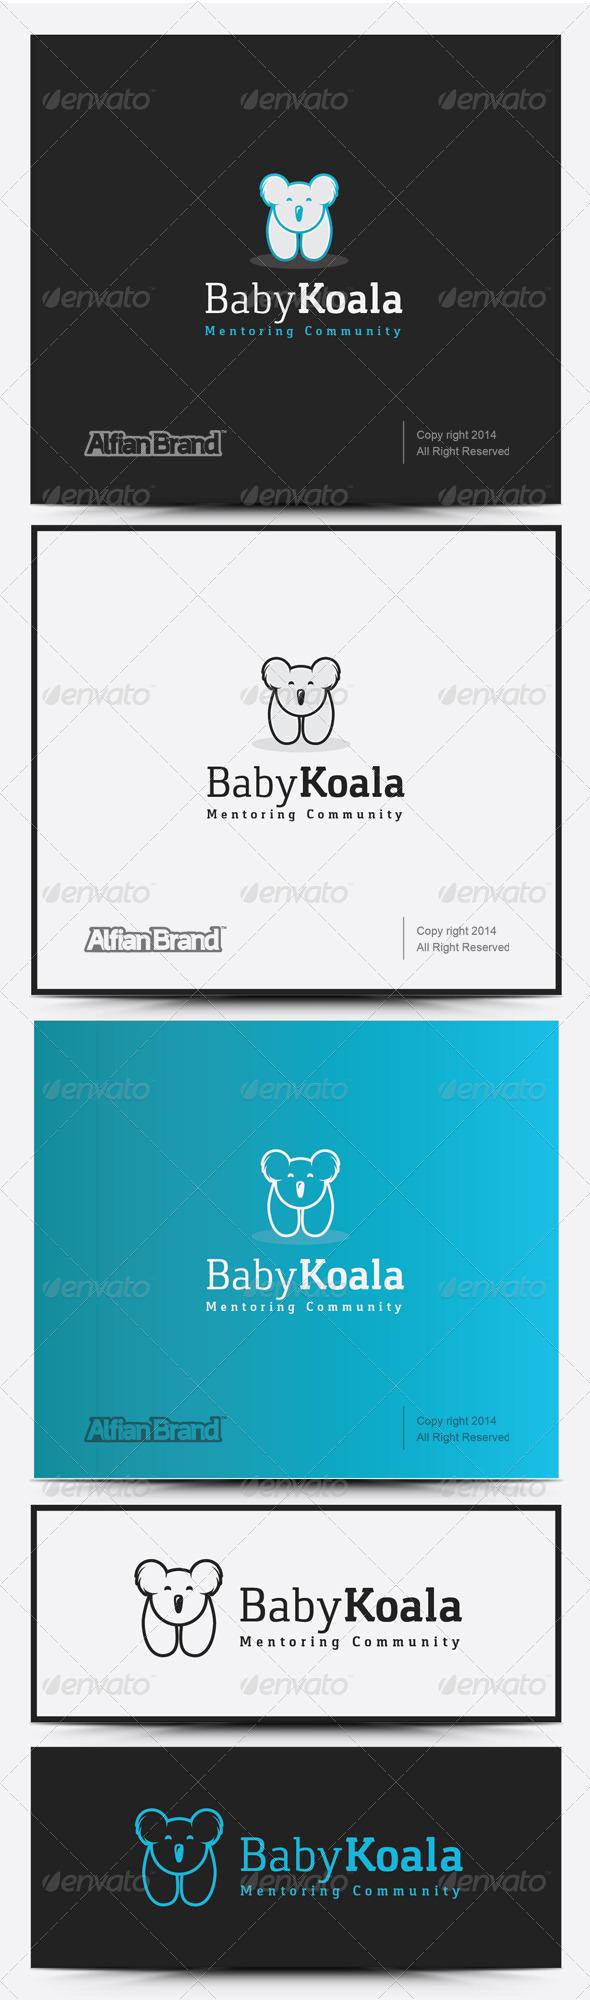 GraphicRiver Baby Koala Logo 8258433